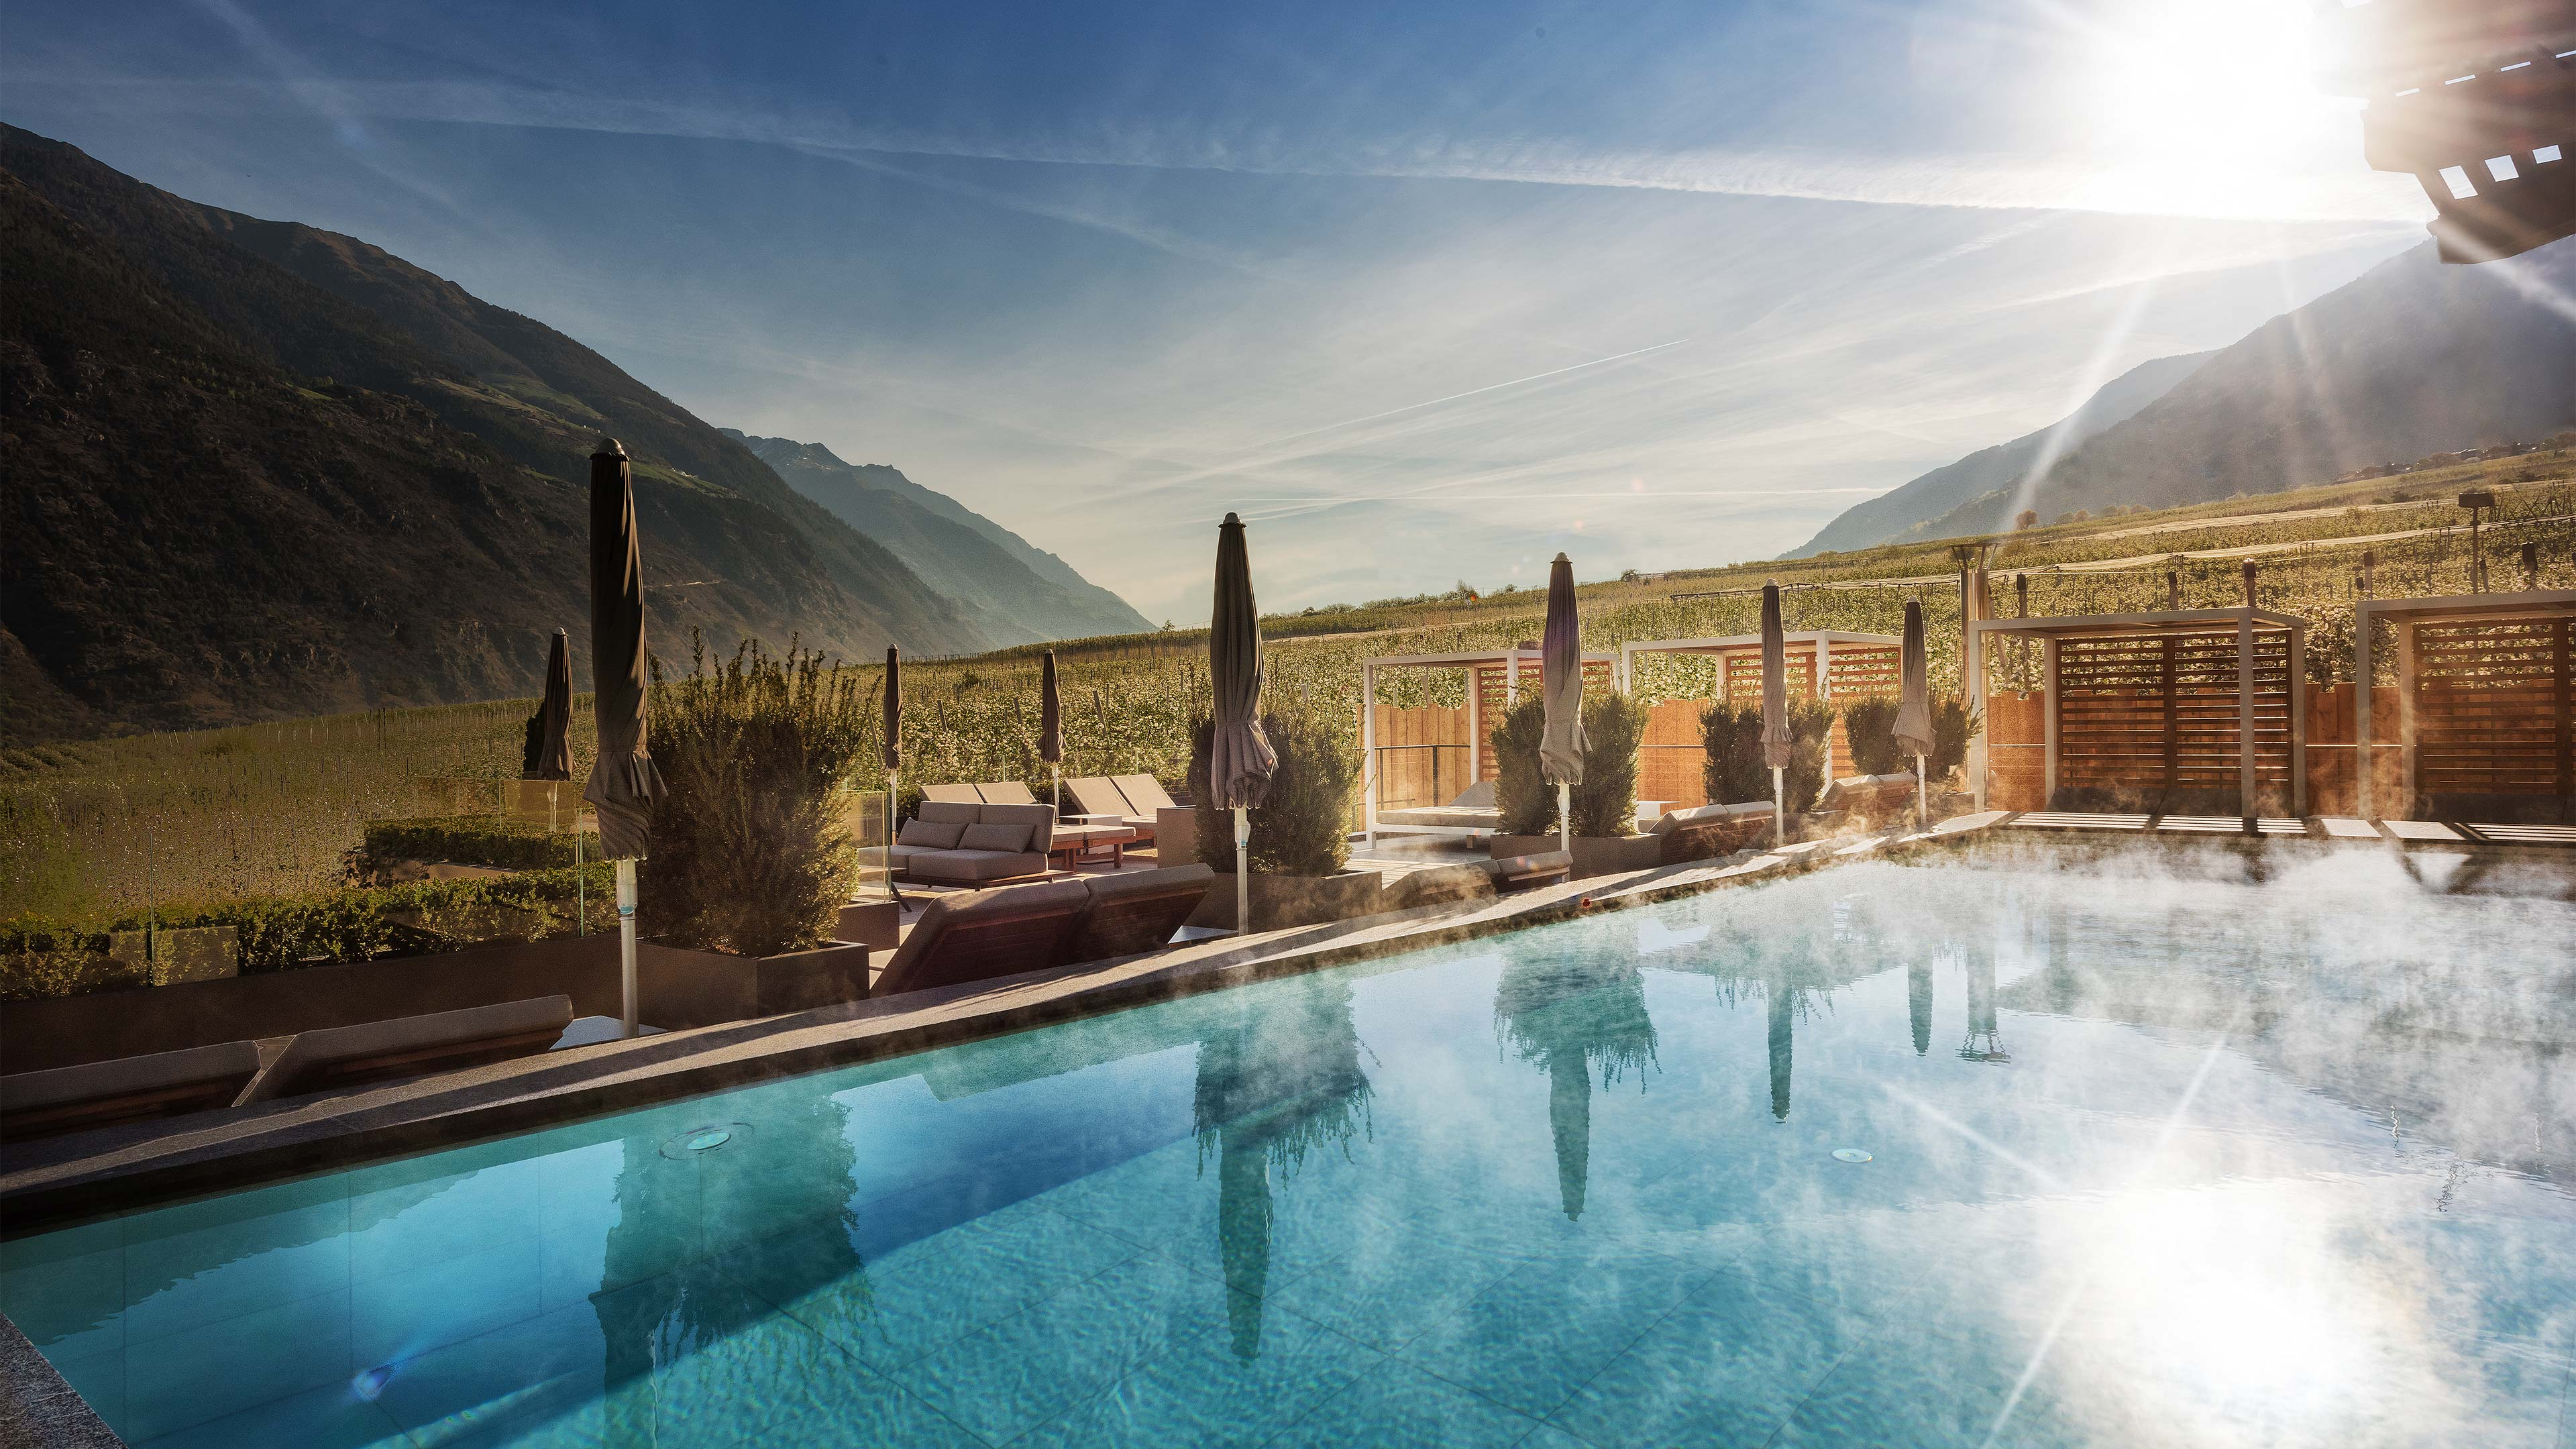 Hotel mit Poolwelt - Vinschgau   5 Sterne - Paradies